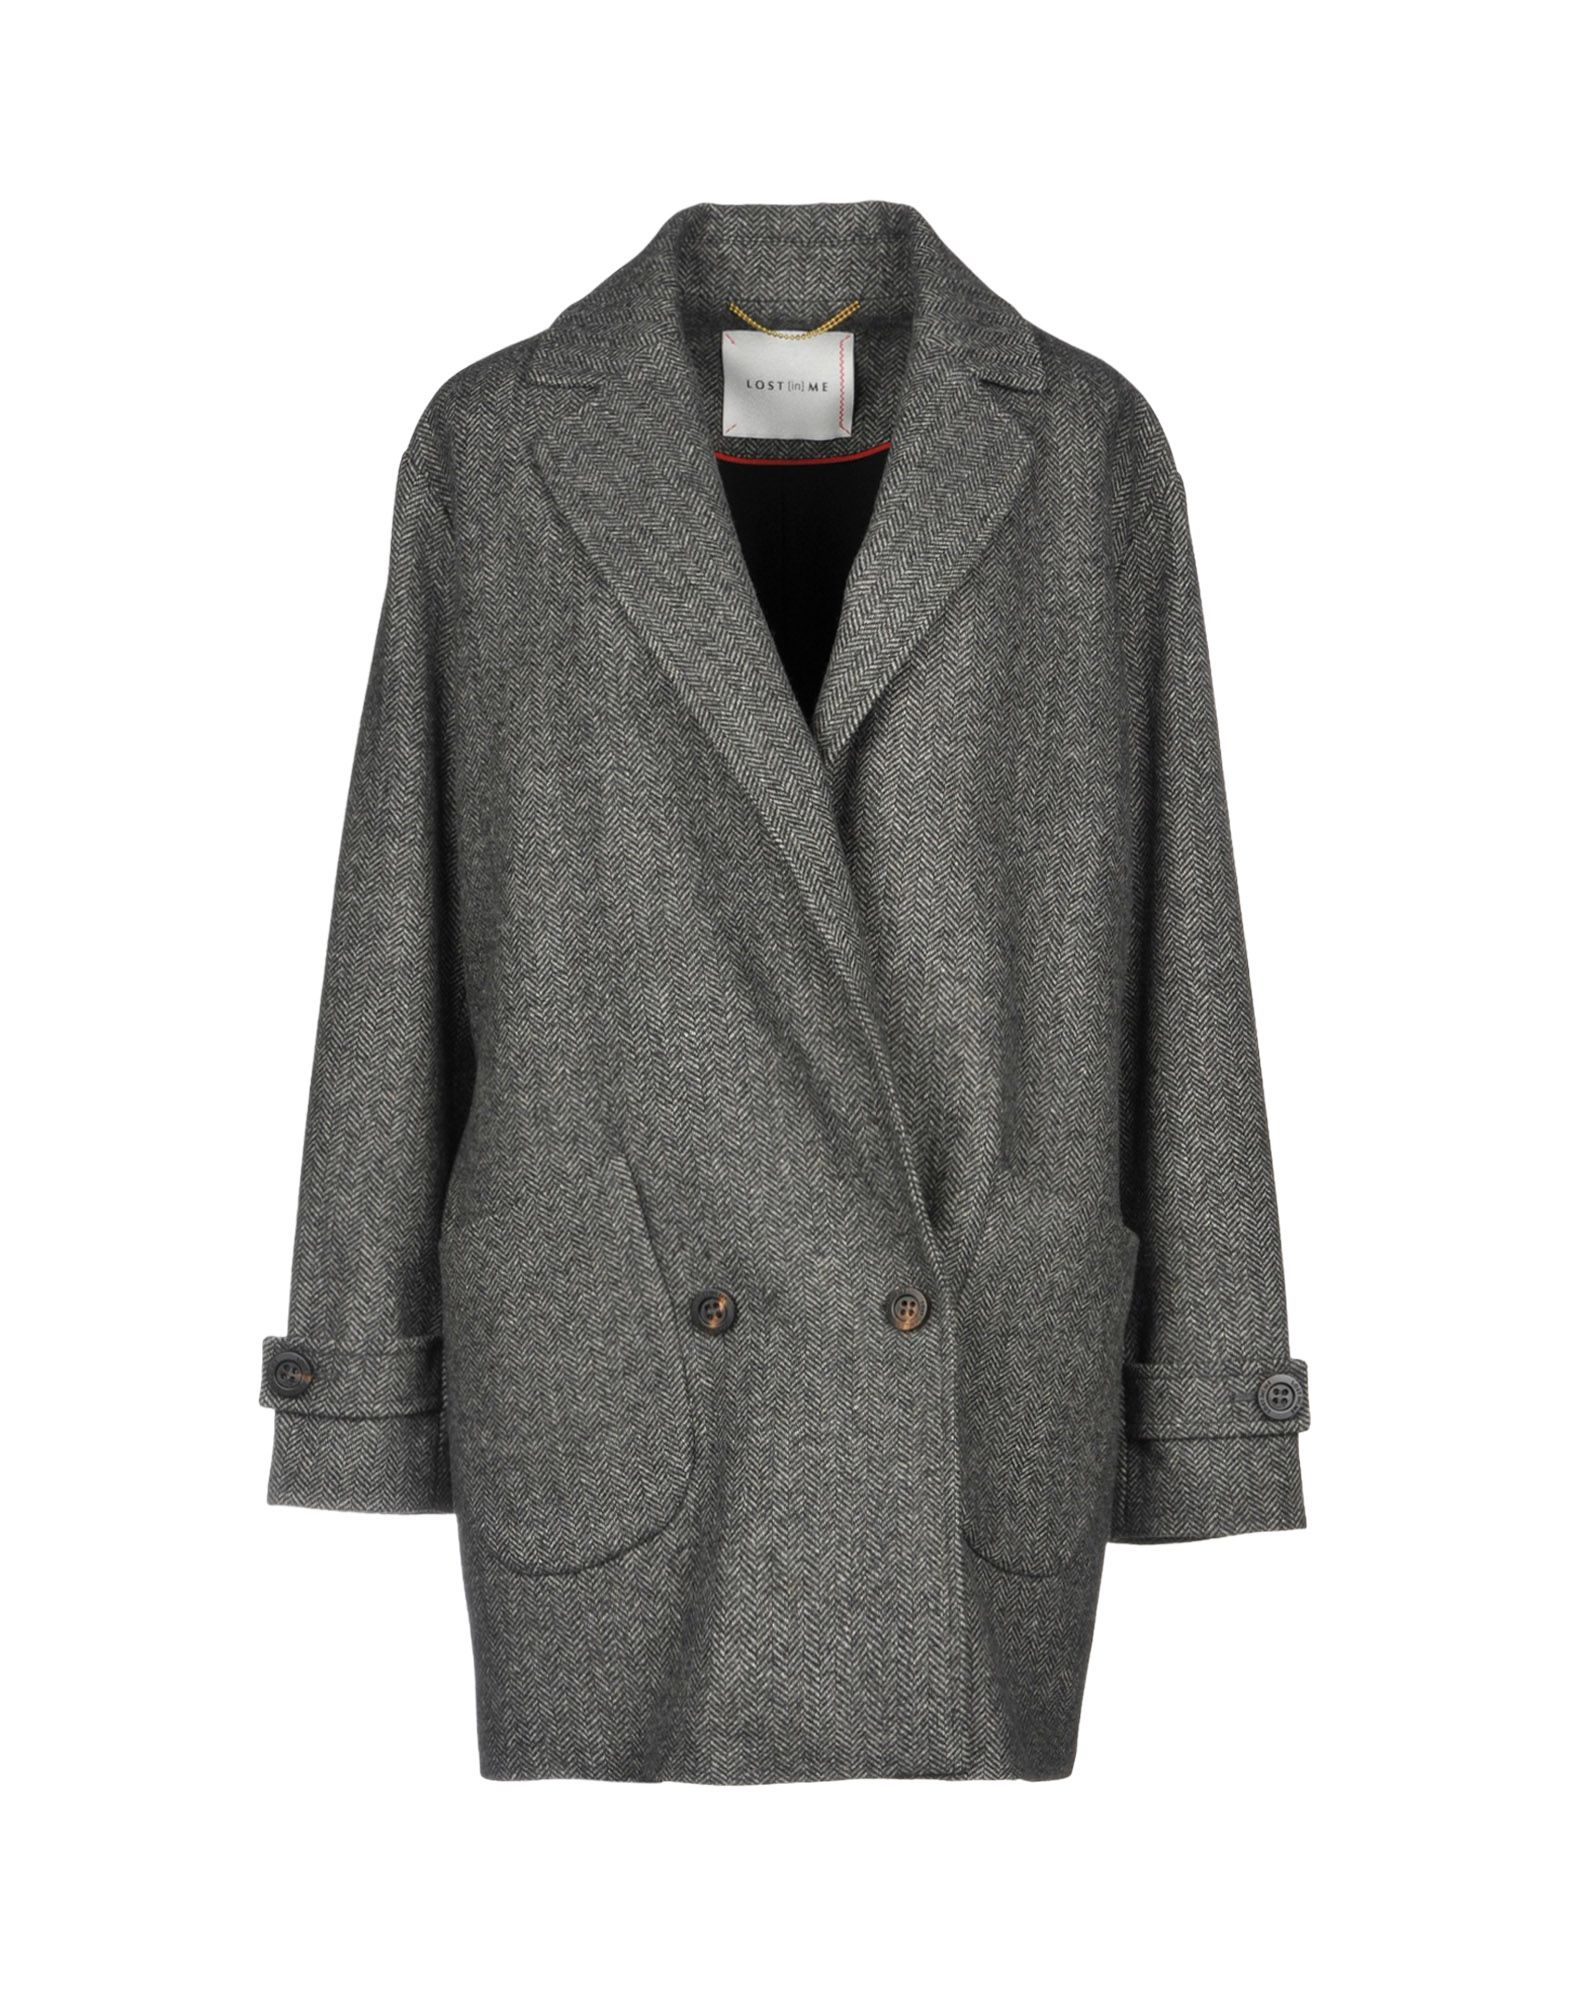 LOST [in] ME Пальто